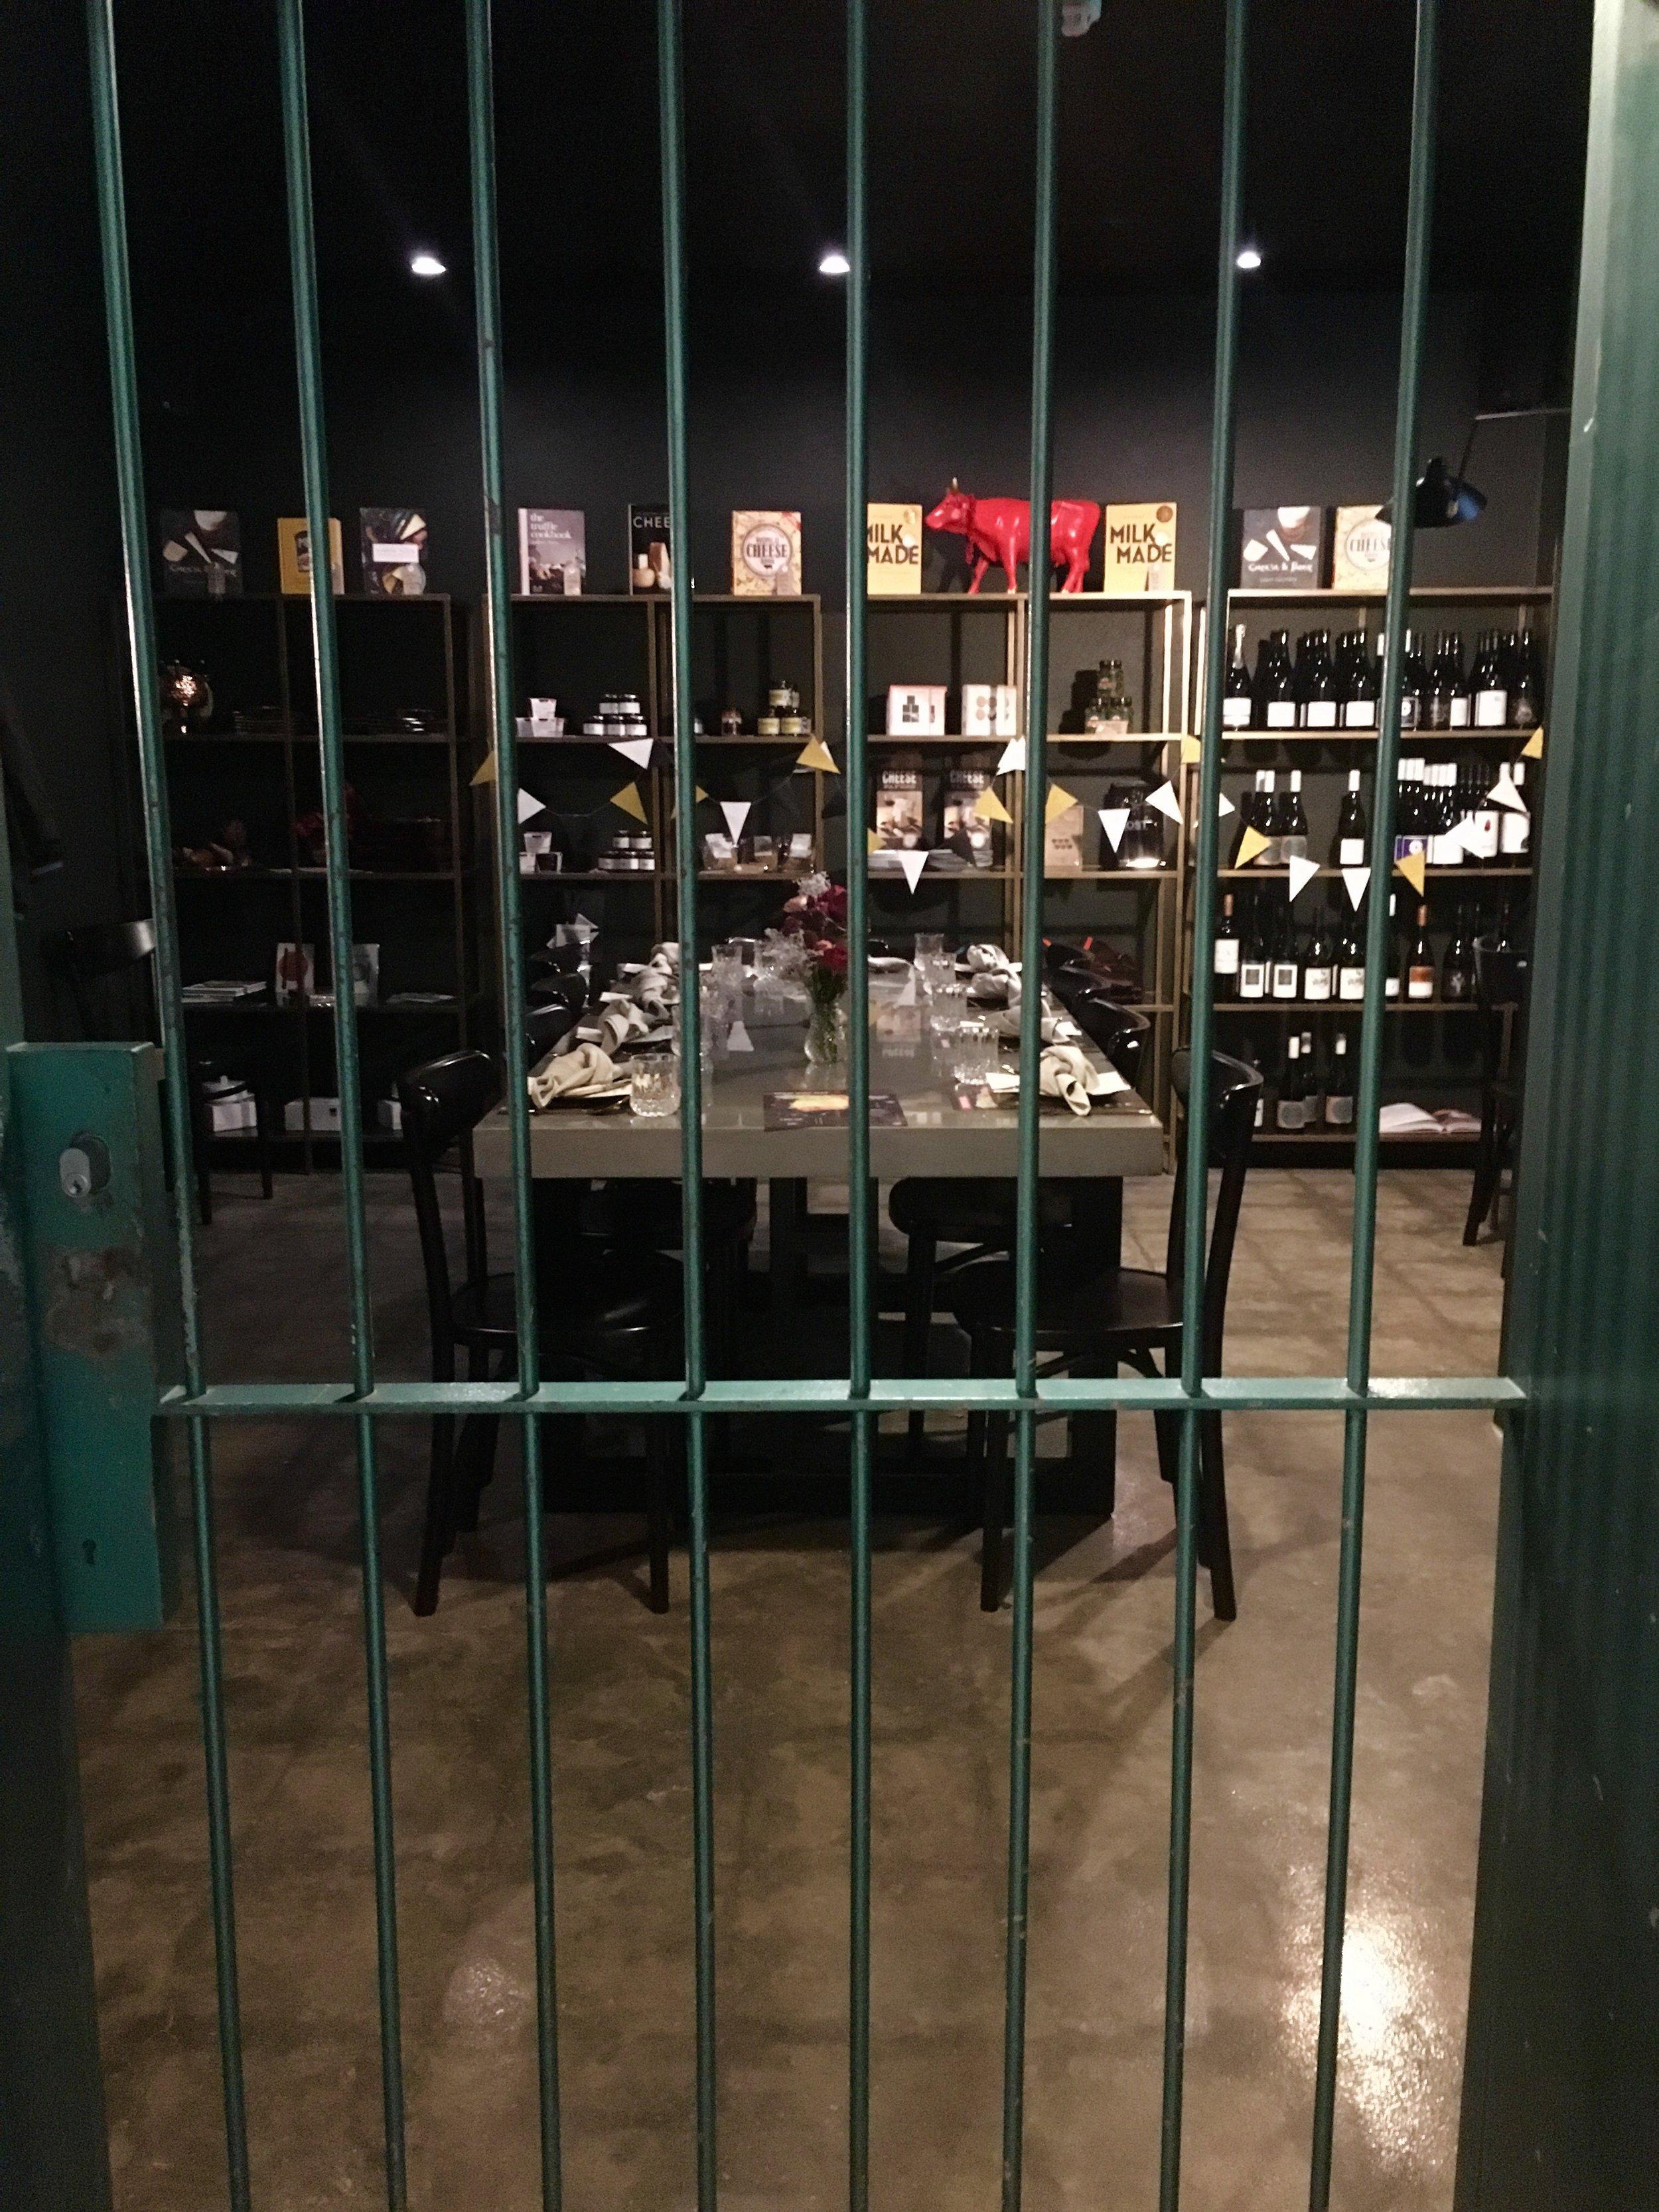 Cheese behind bars.jpeg